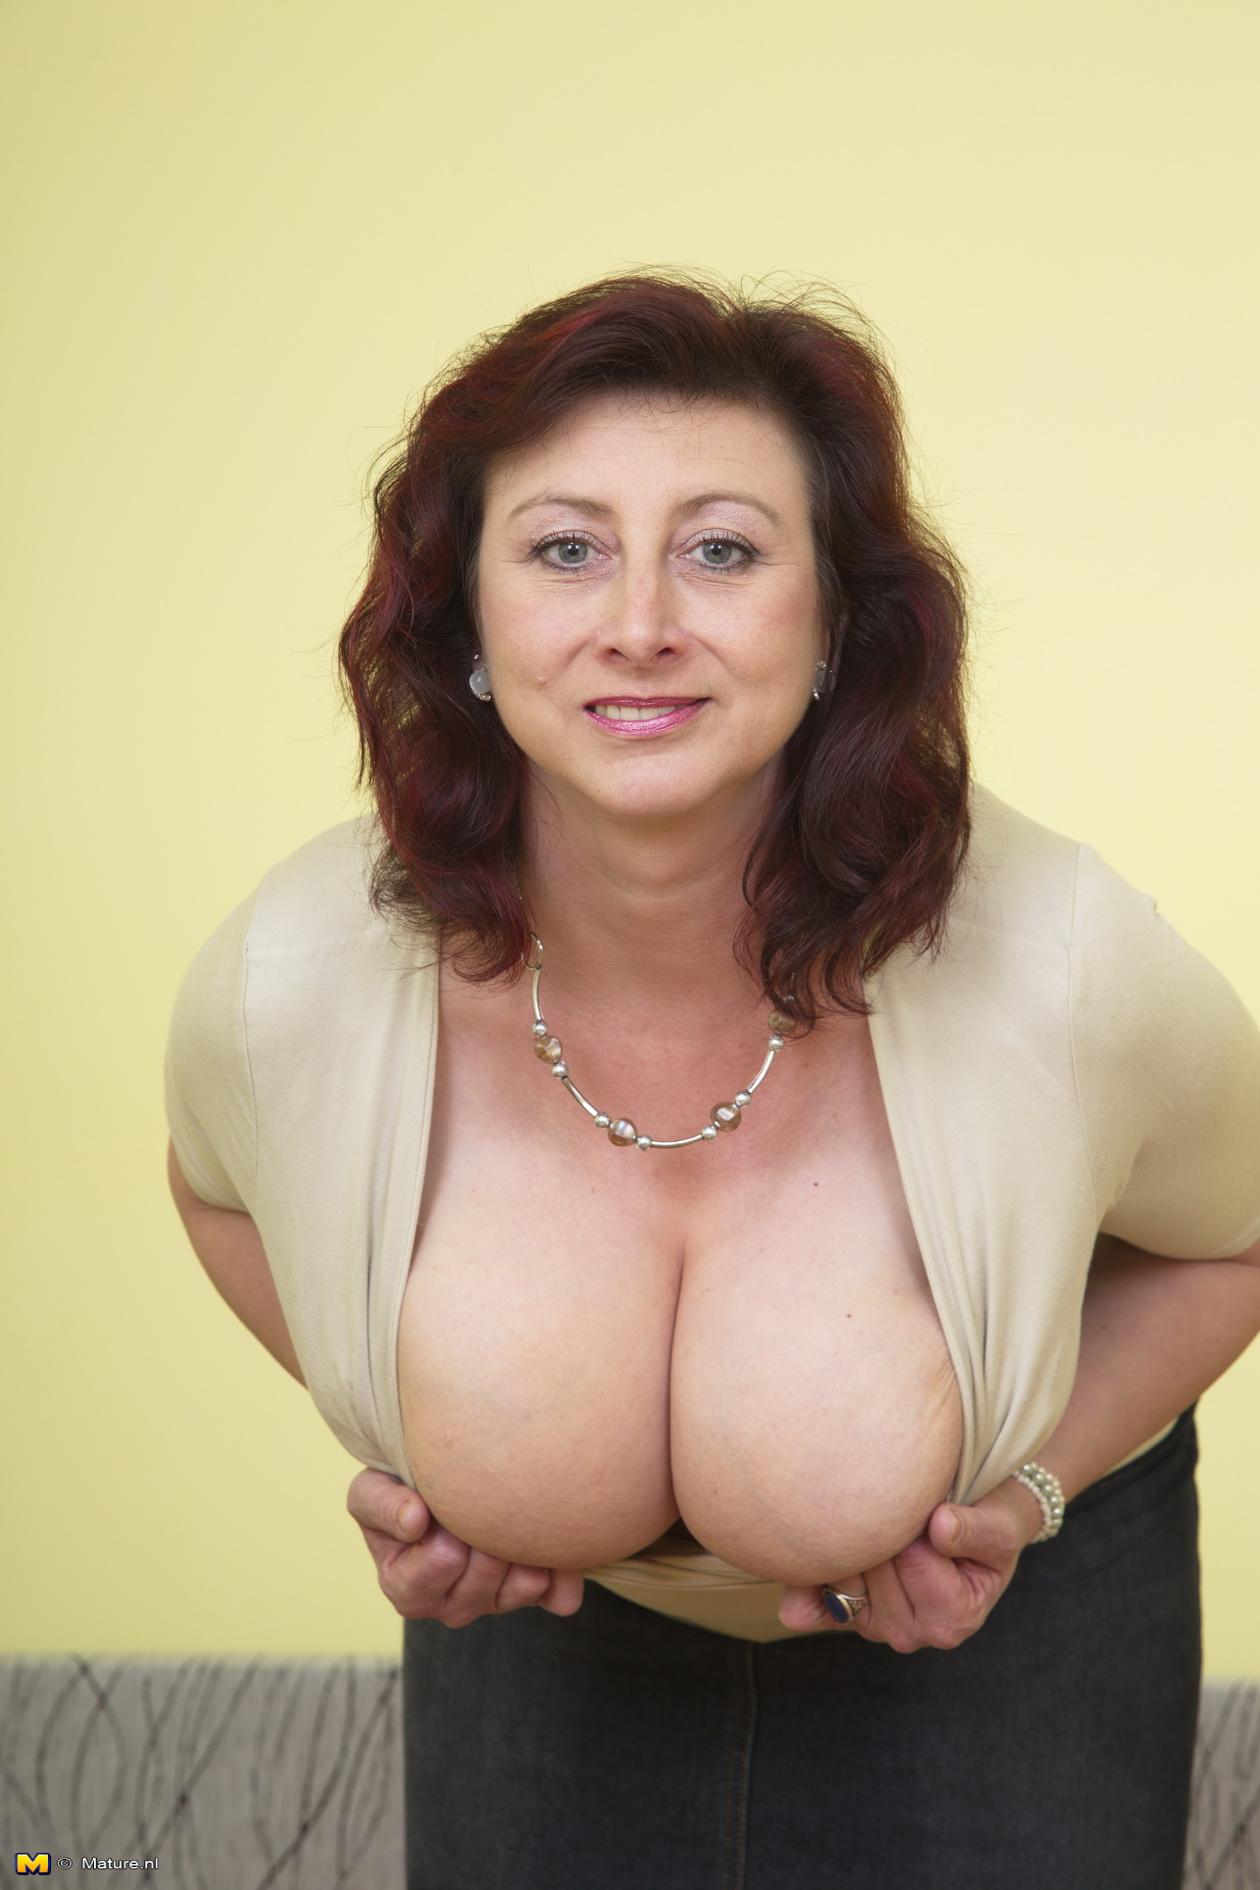 100 gratis sexdating thai massage i aalborg nye bryster